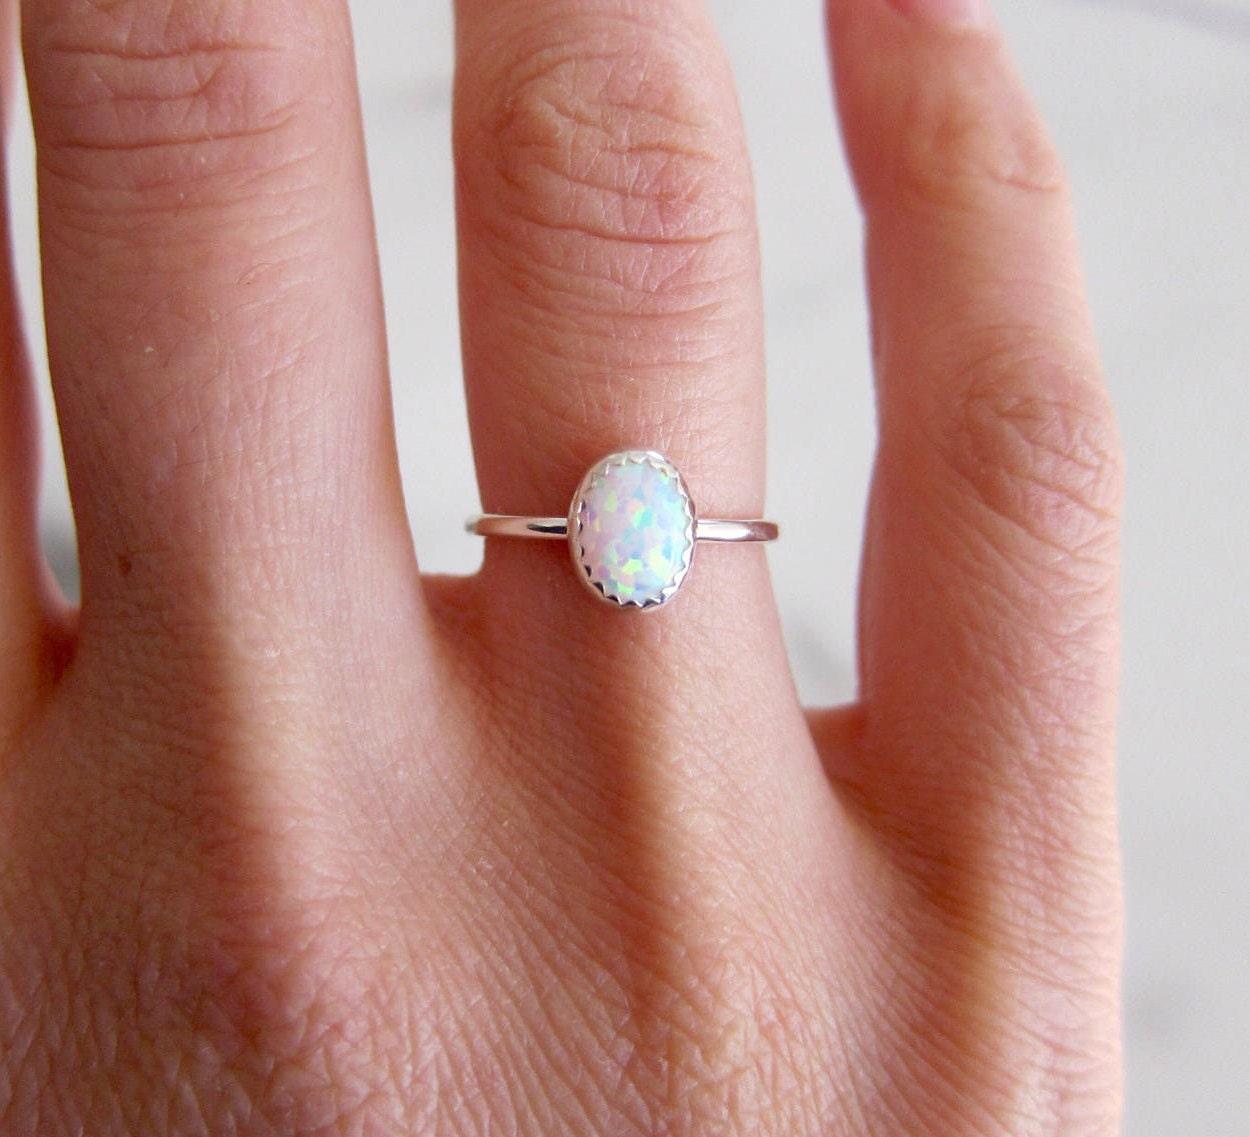 Opal ring. Silver ring band. Gemstone ring. White opal ring.